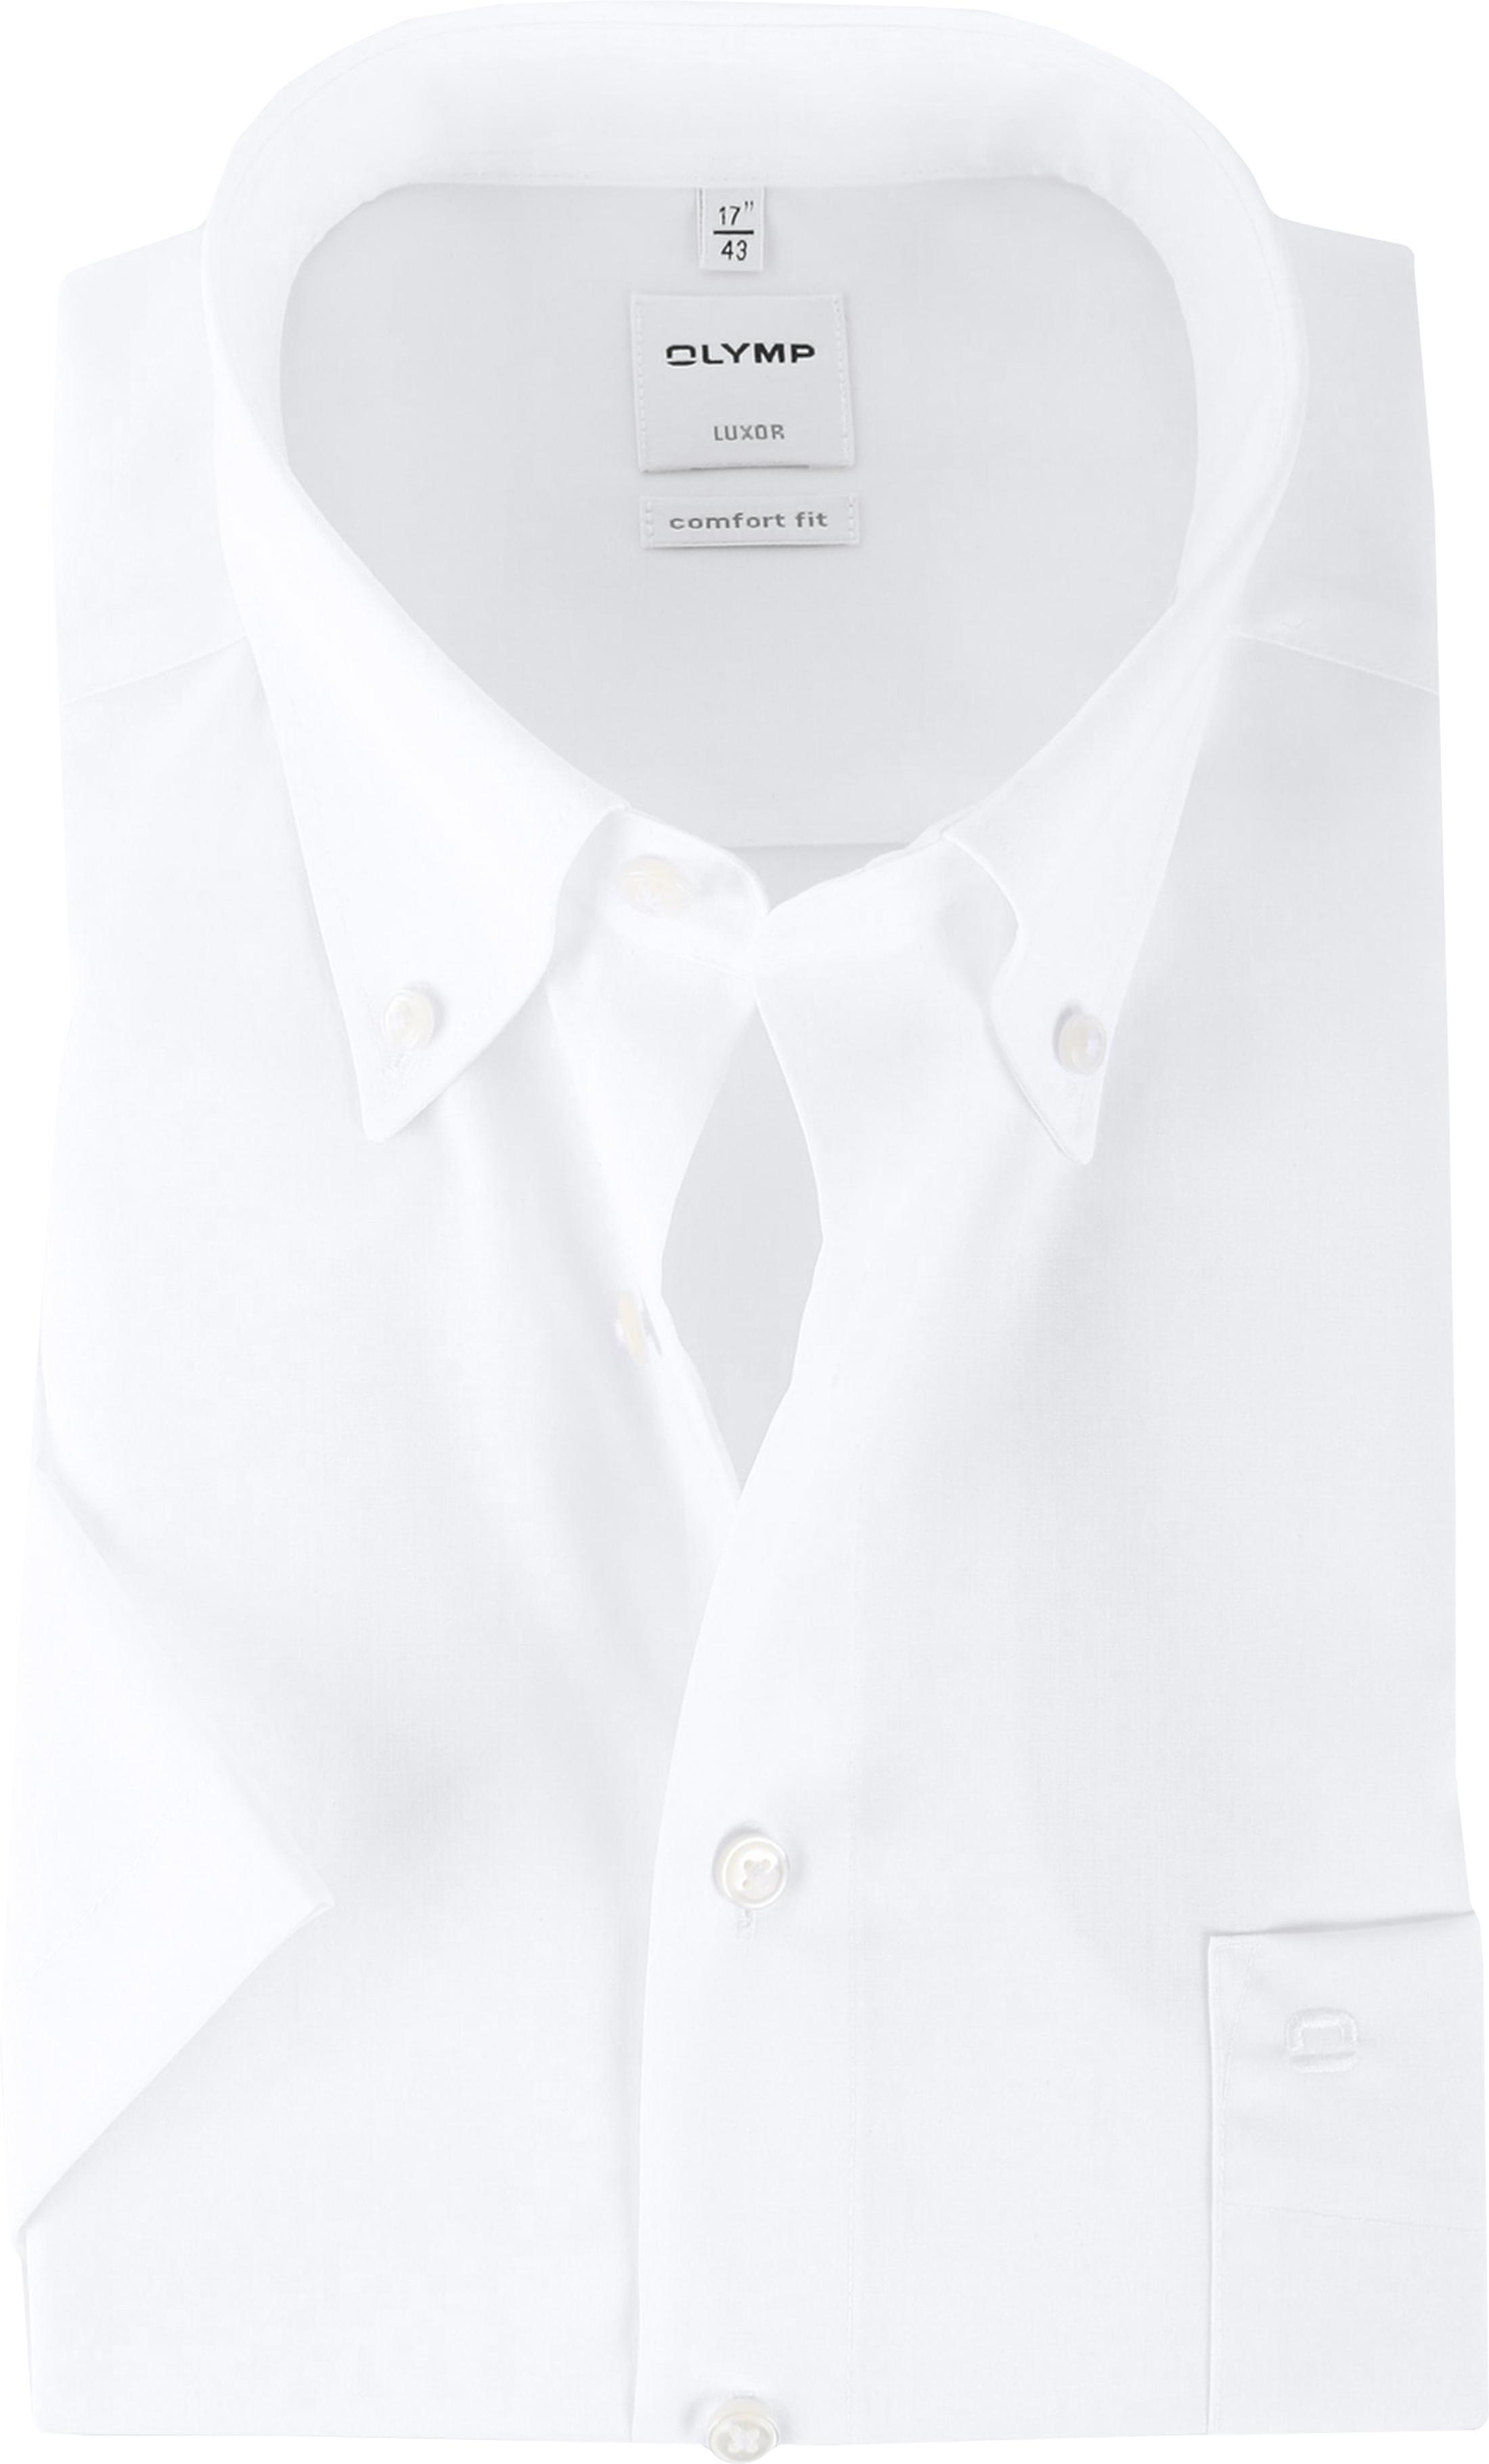 OLYMP Luxor Overhemd Comfort Fit Wit Korte Mouw foto 0